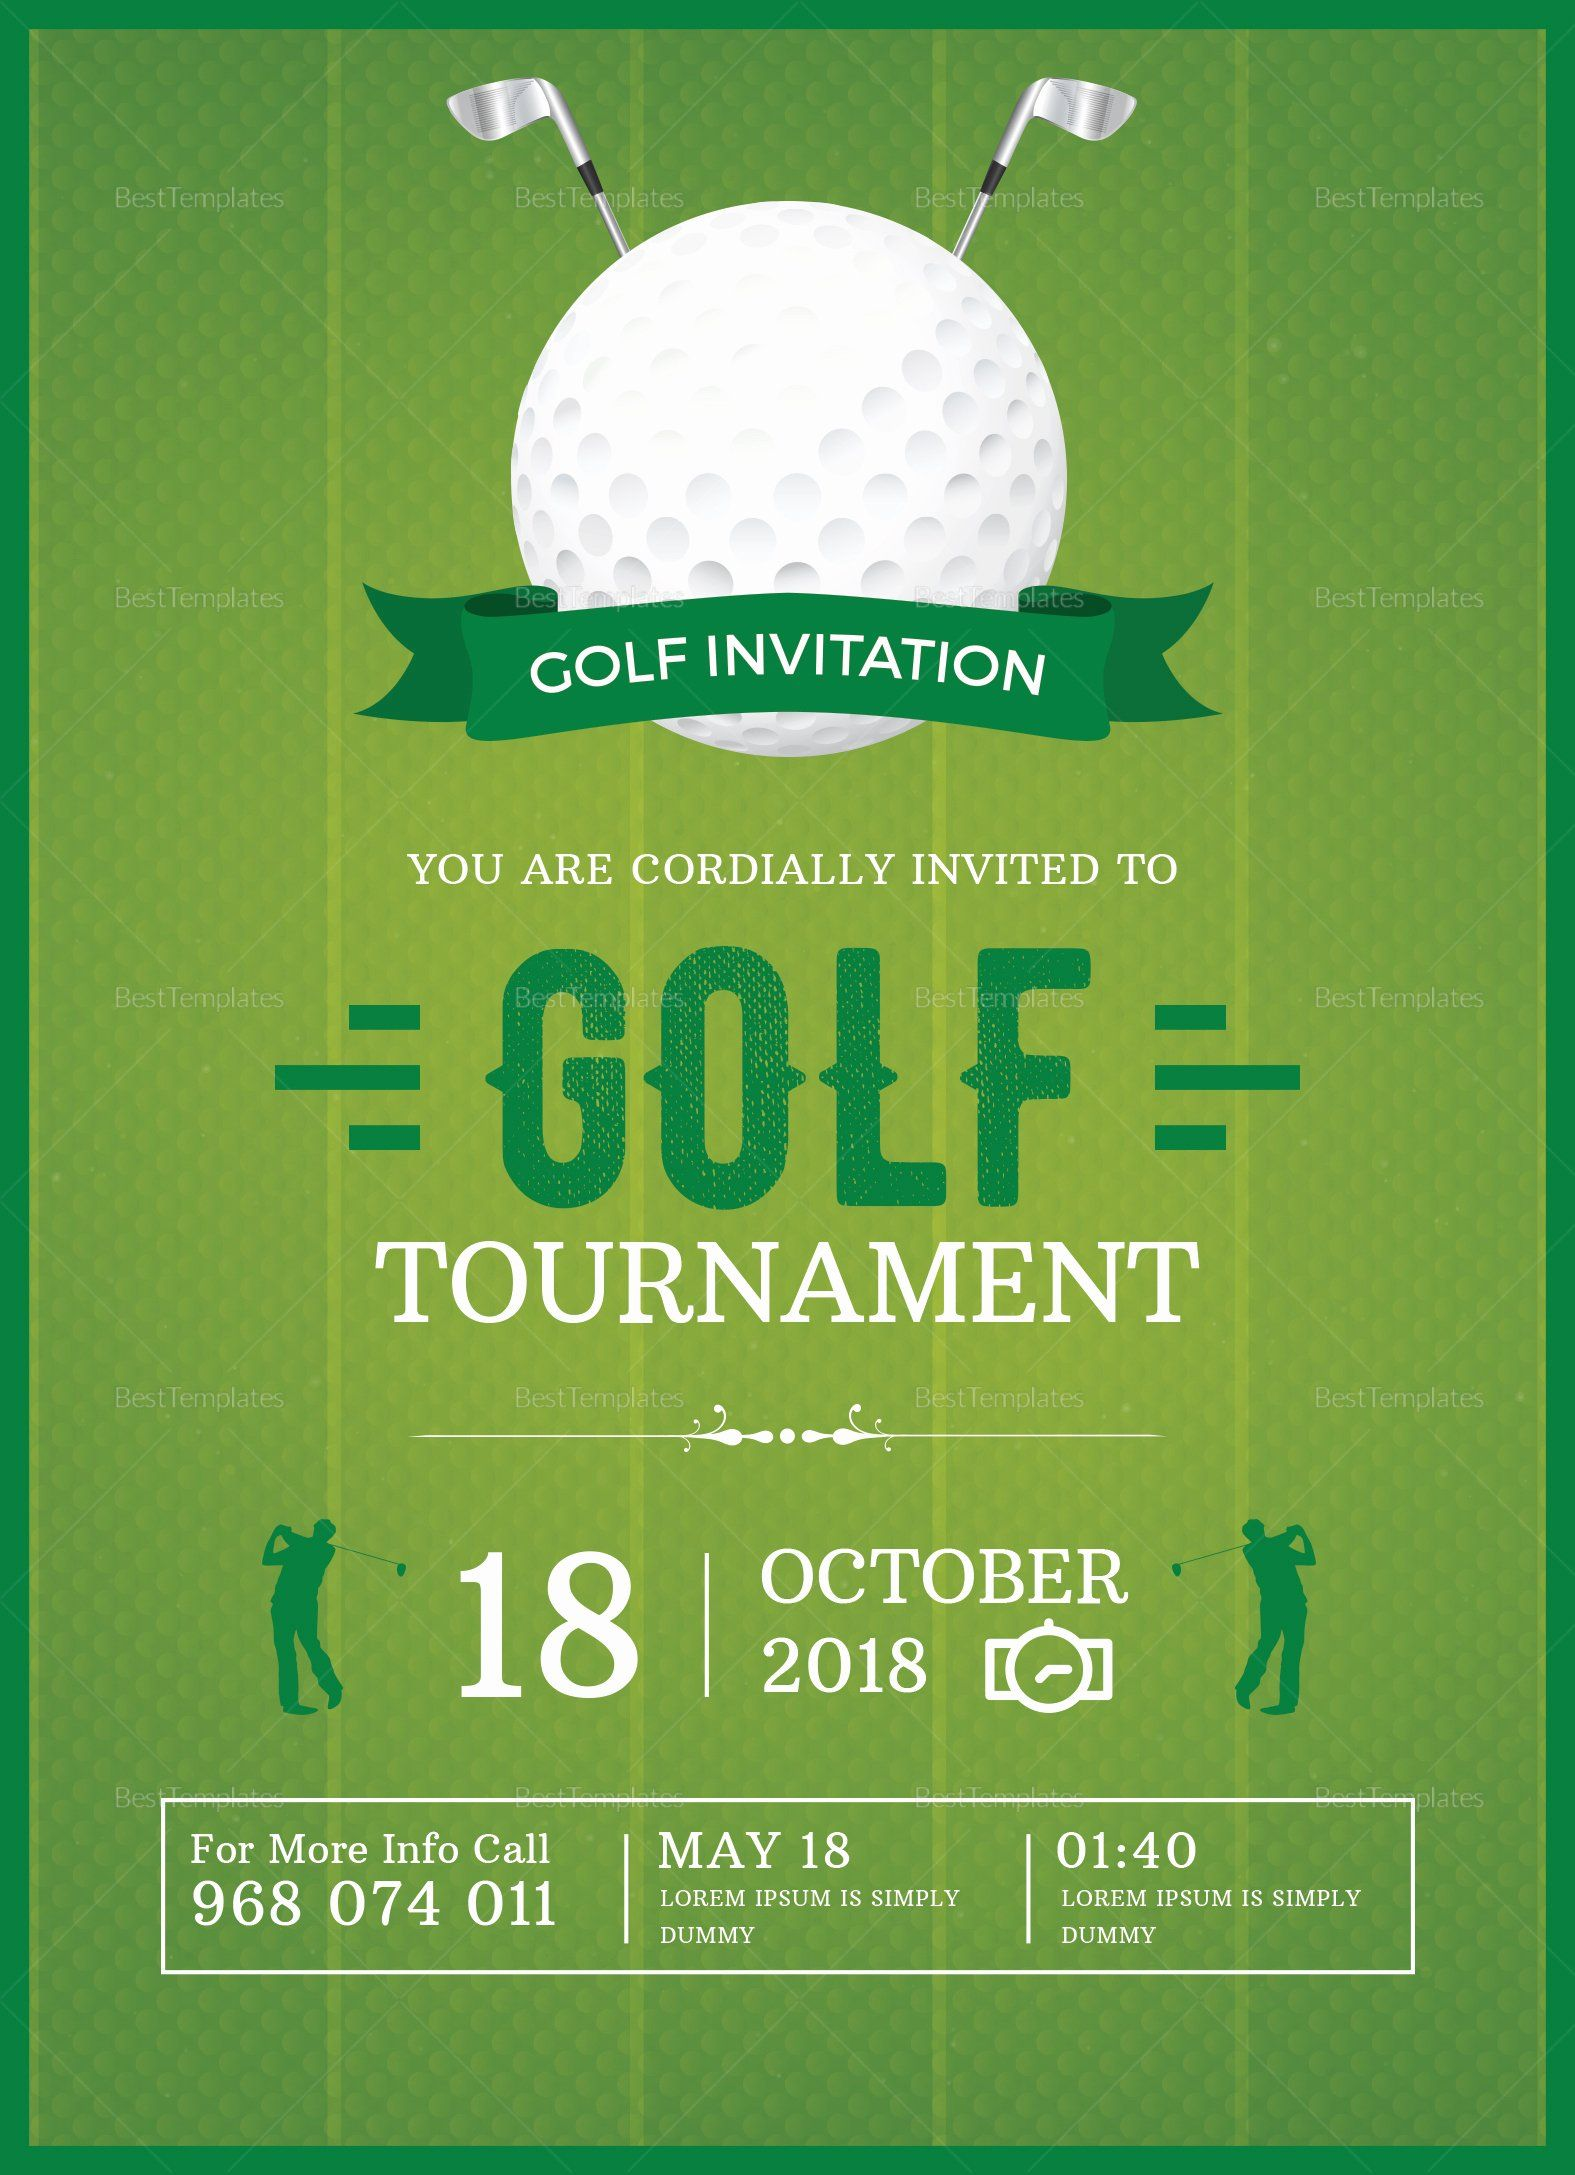 Golf Tournament Invitation Template Free Fresh Golf Invitation Design Template In Word Psd Publi Golf Invitation Invitation Template Invitation Design Template